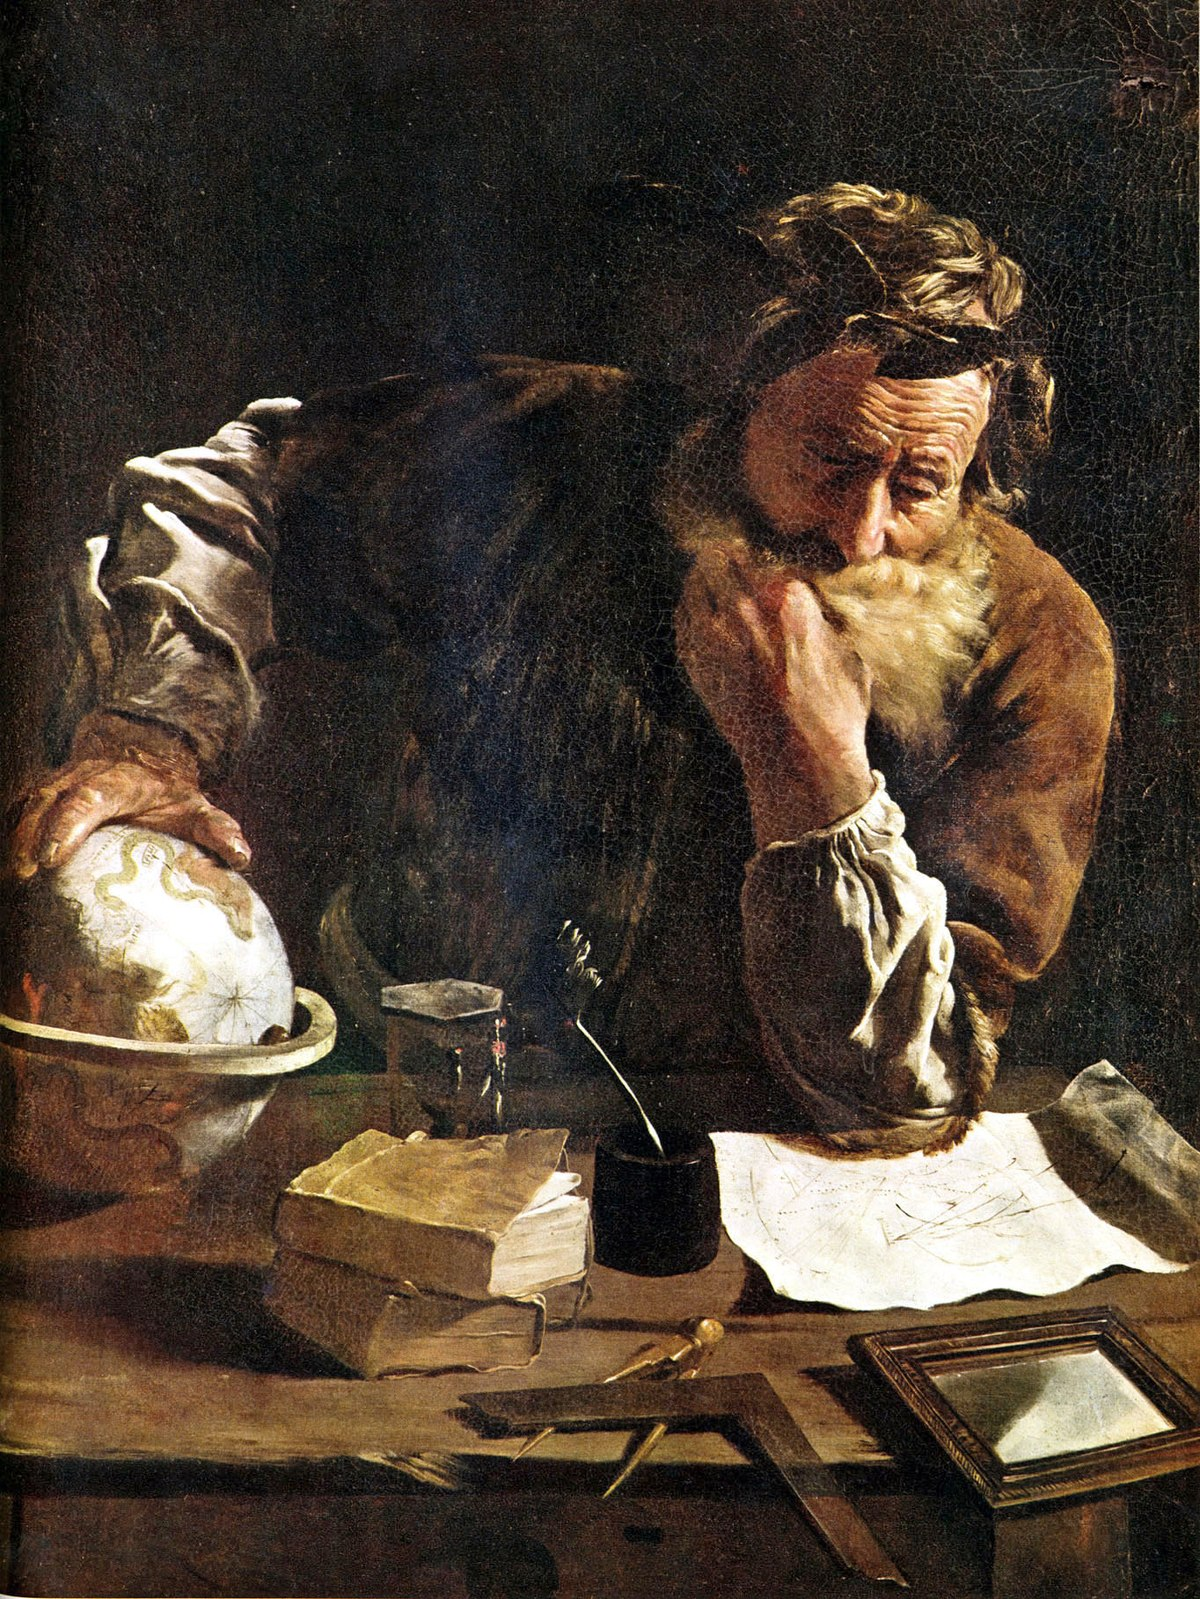 1200px-Domenico-Fetti_Archimedes_1620.jpg